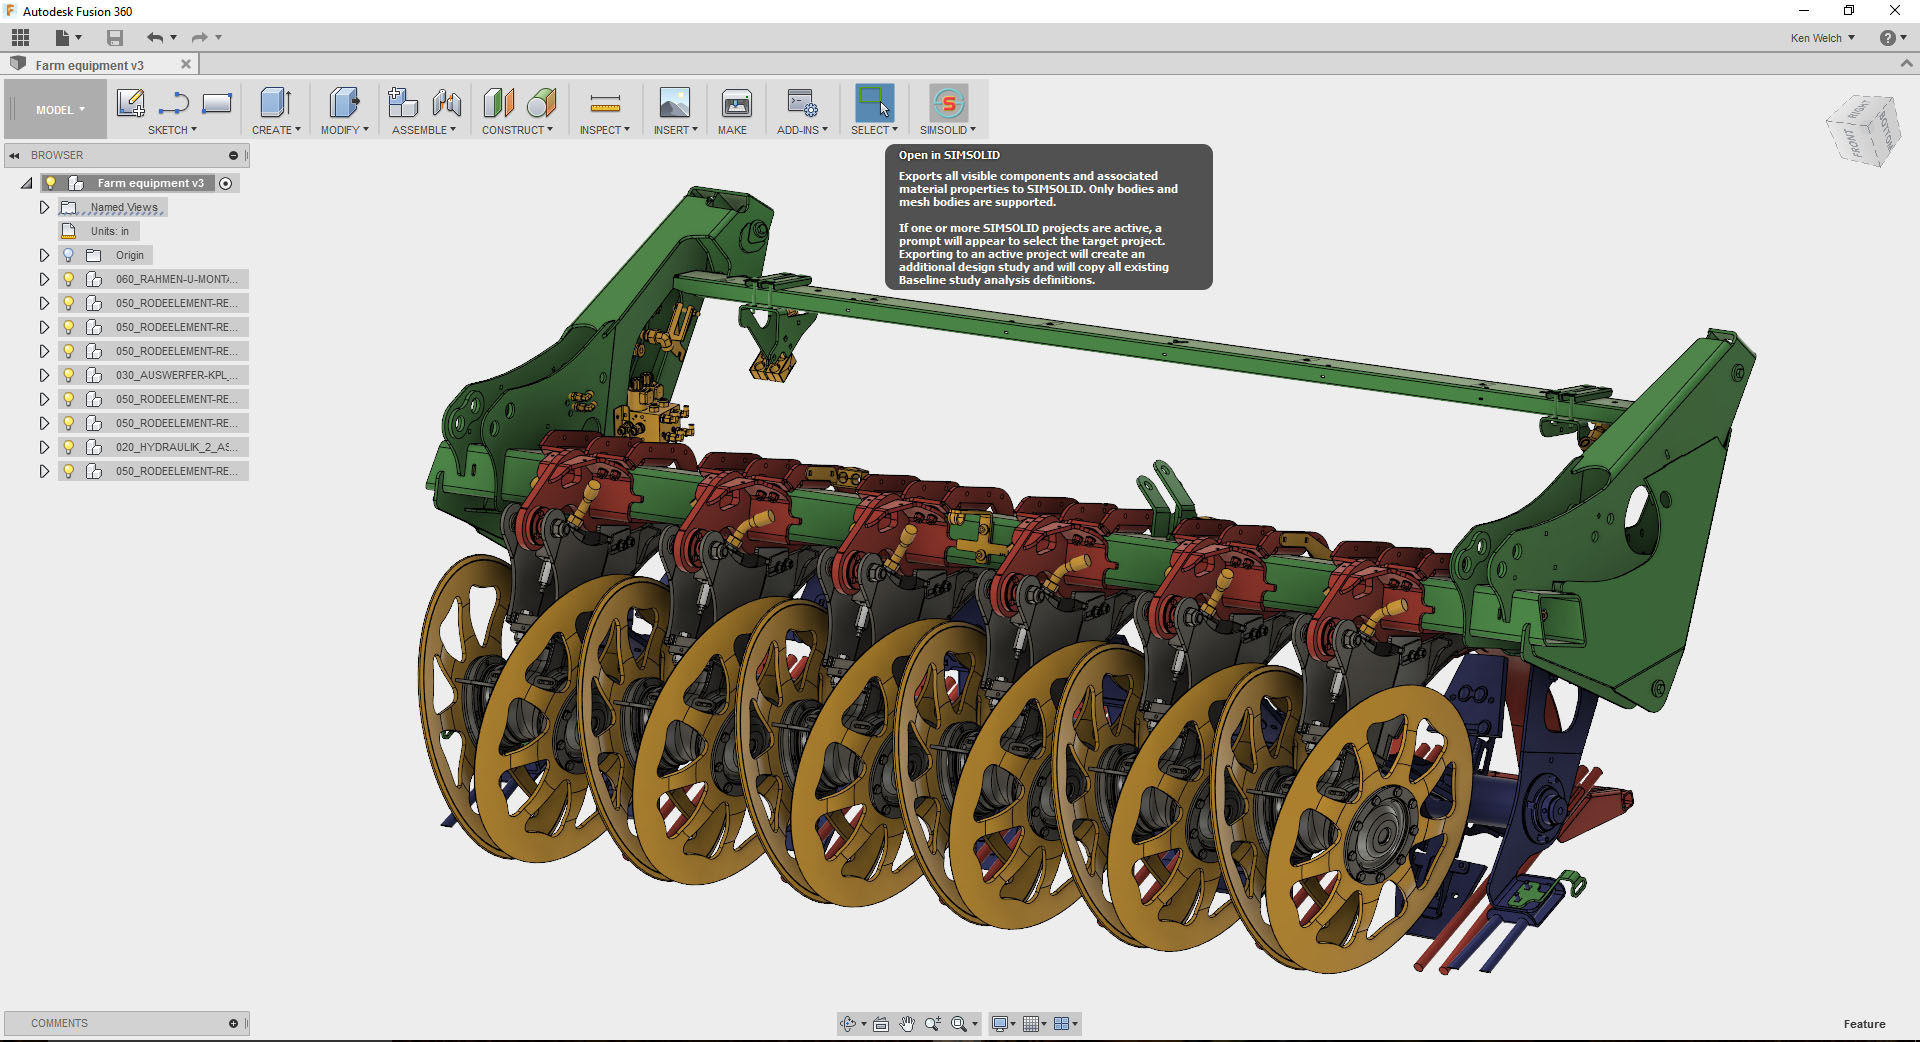 Farm-equipment-2-3500-3500